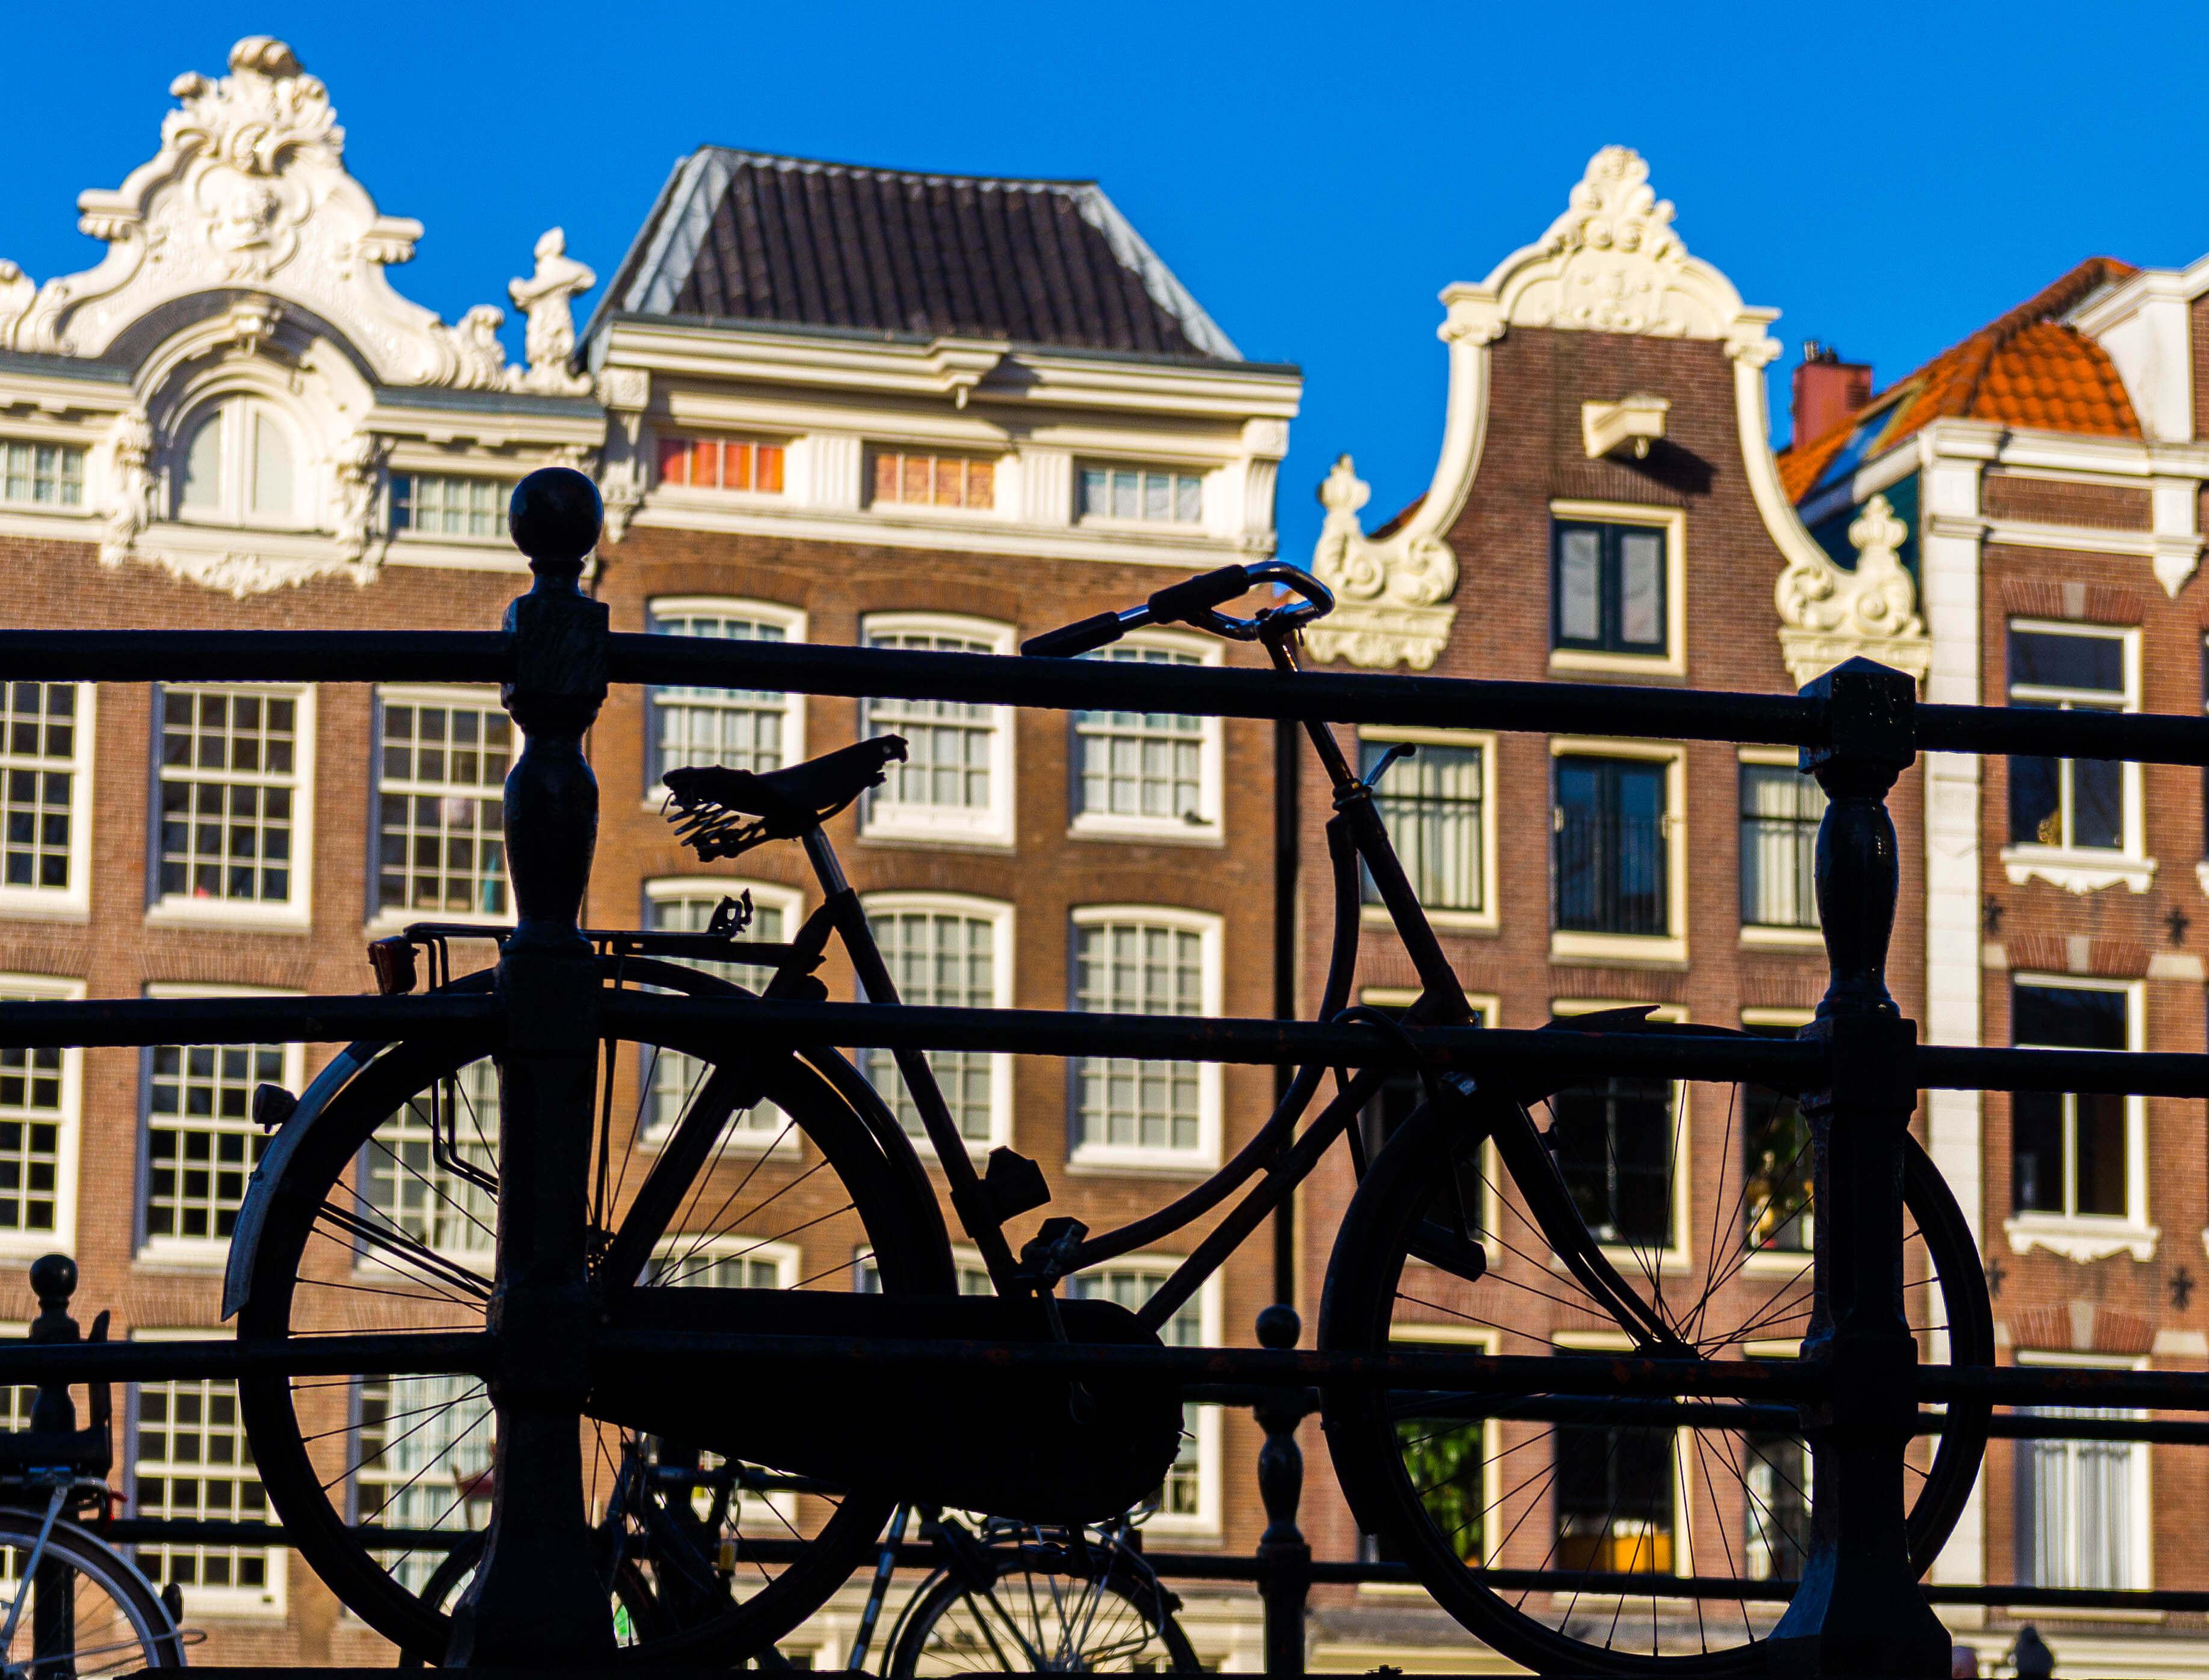 Amsterdam Bike Silhouette